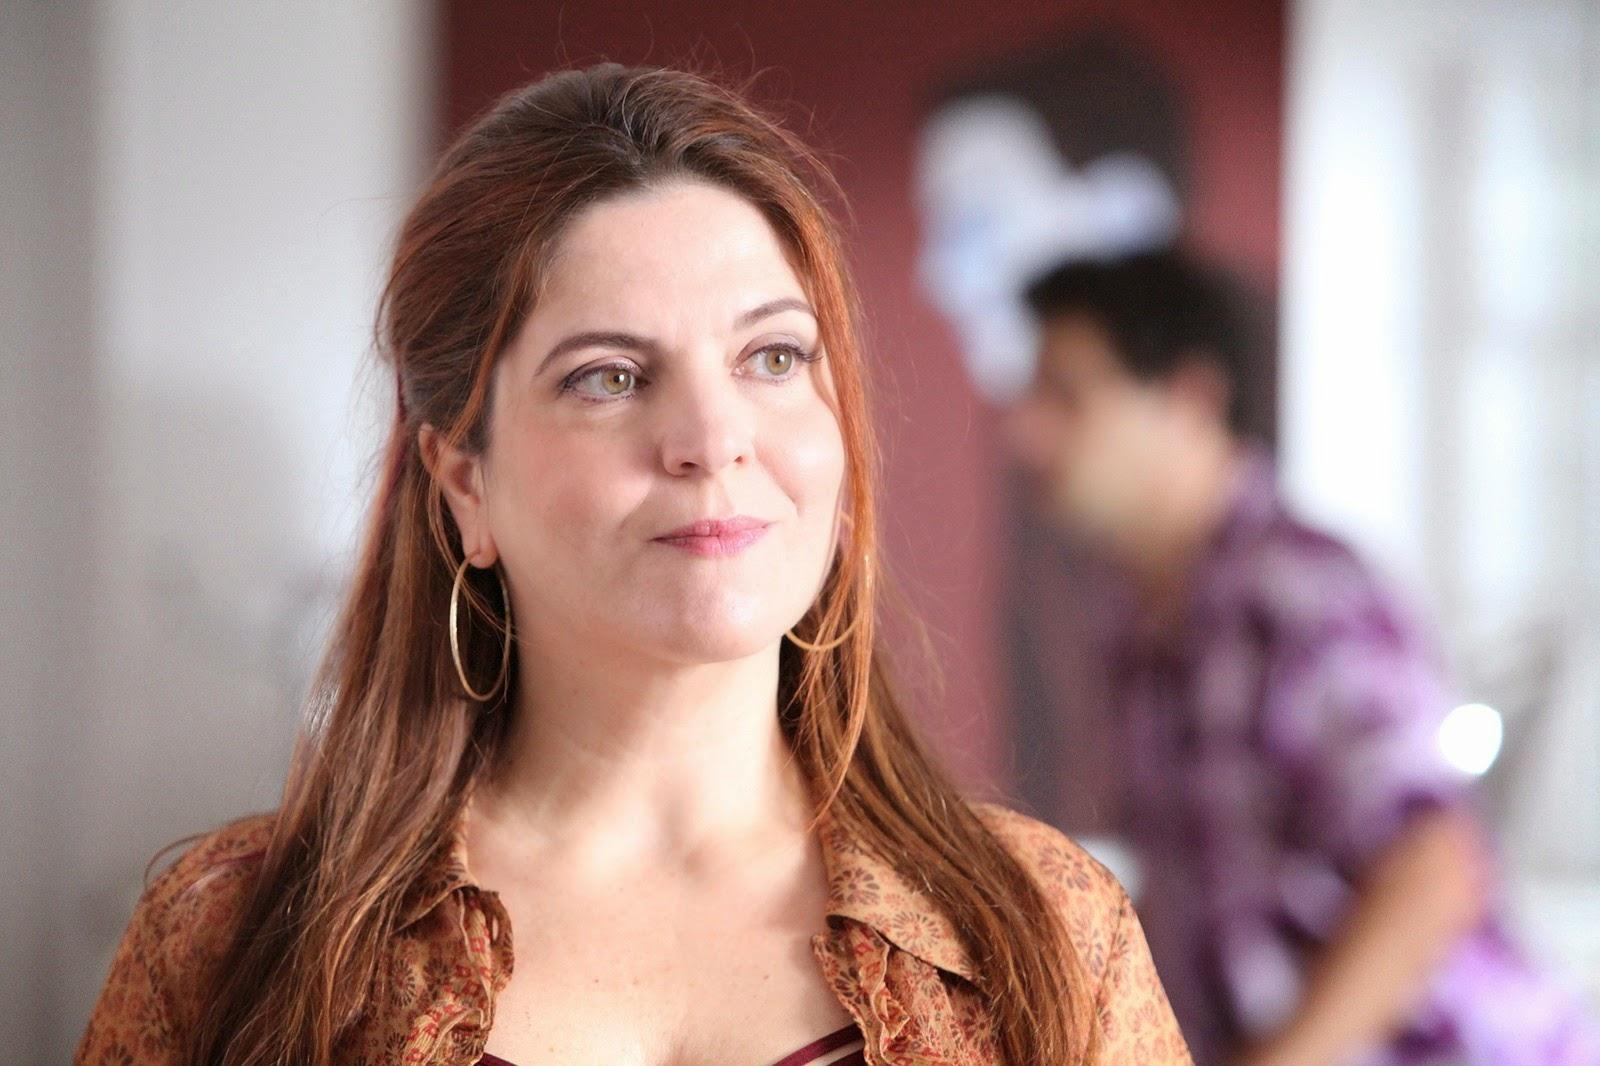 Agnès Jaoui dans L'Art de la fugue, de Brice Cauvin